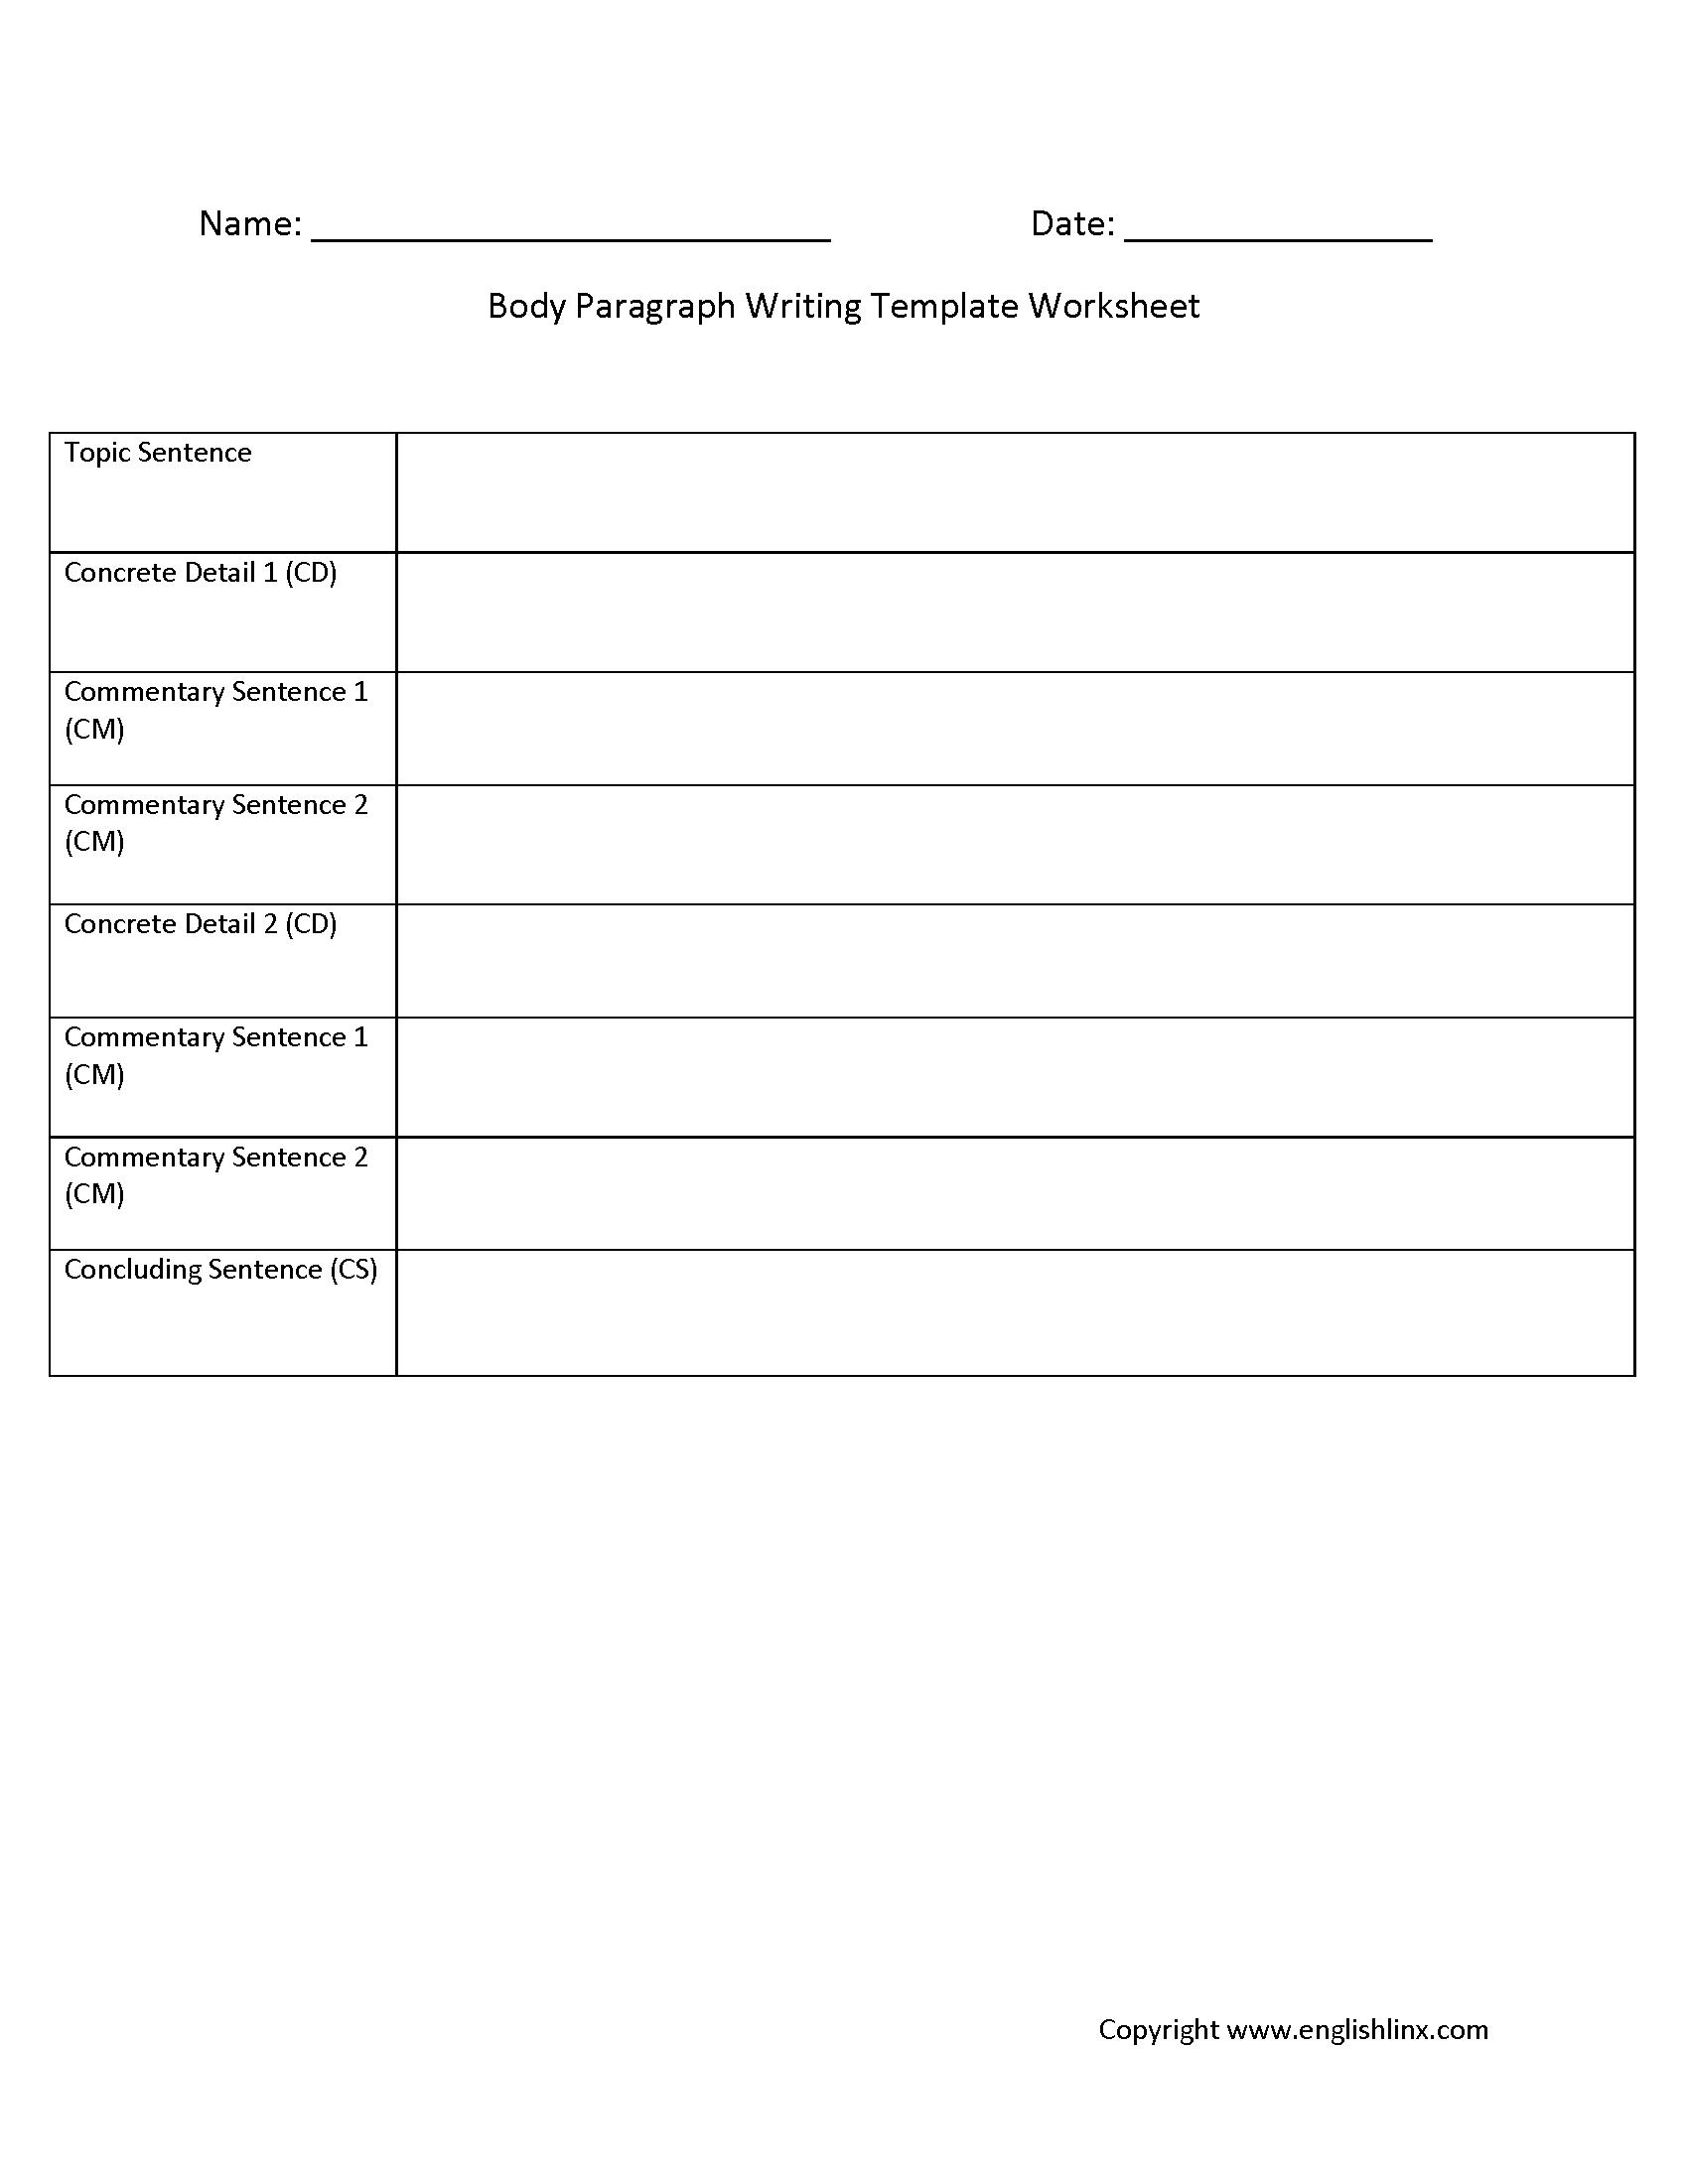 Body Paragraph Writing Template Worksheet